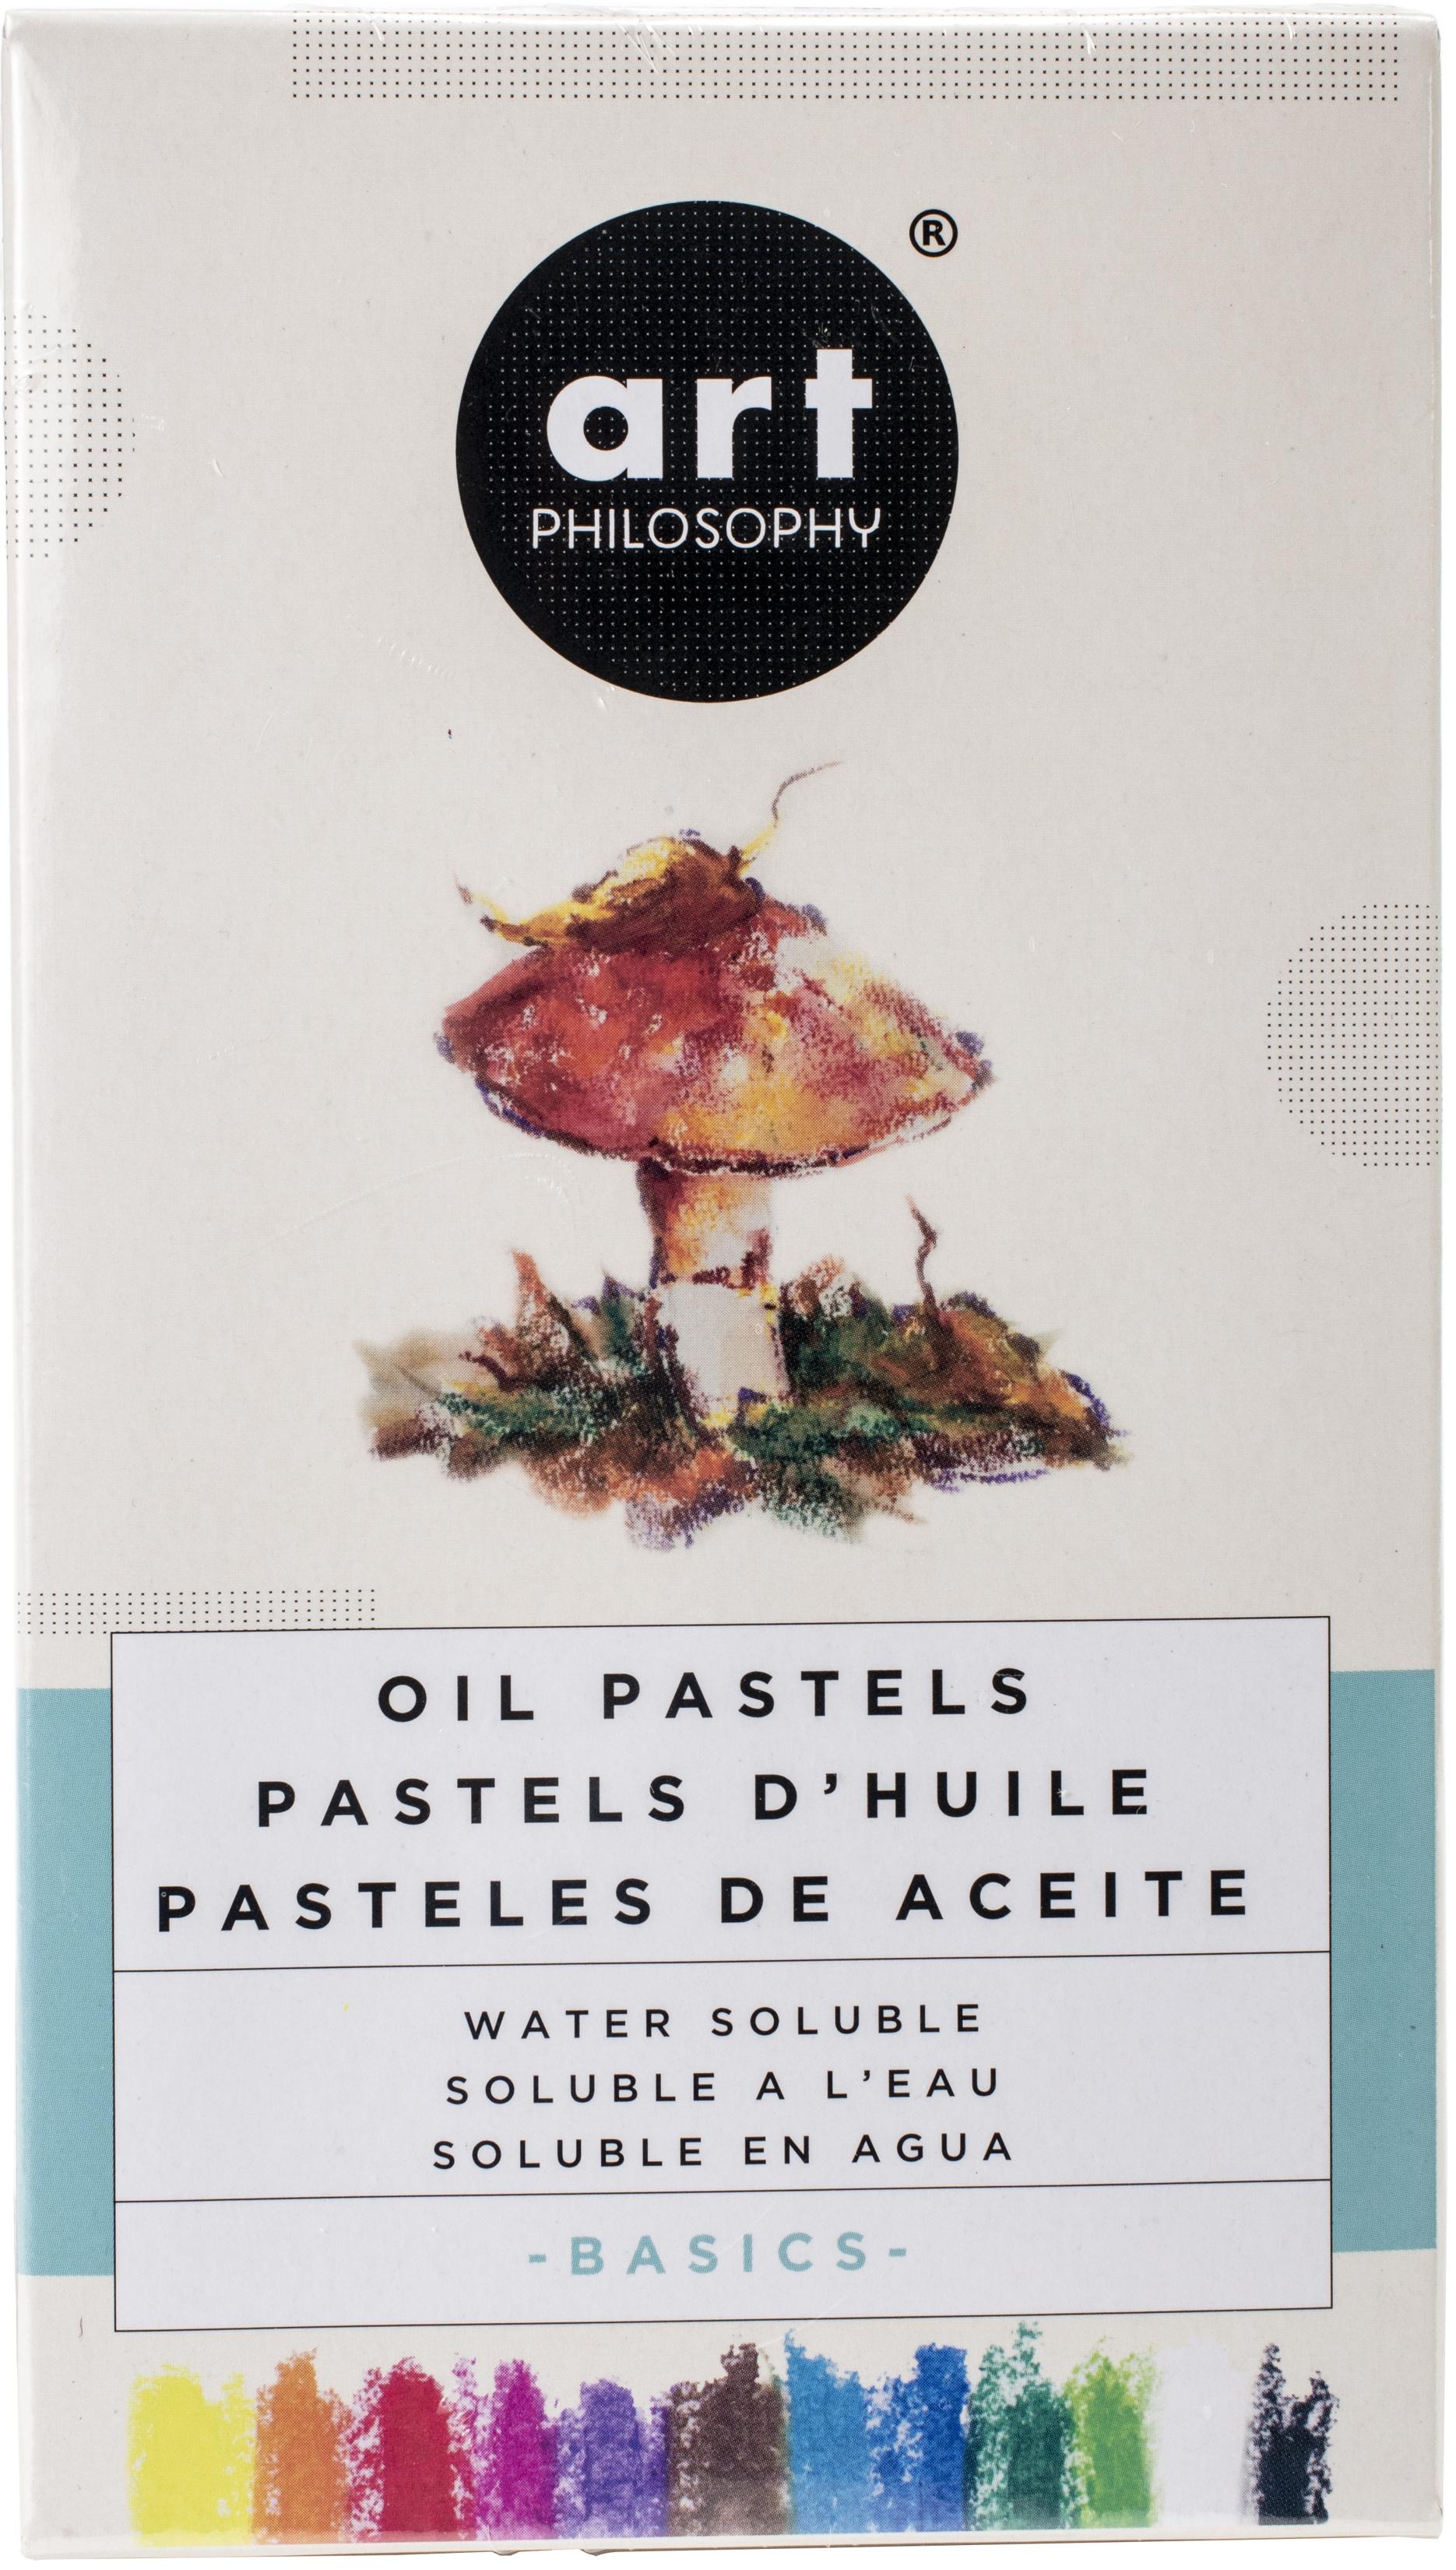 basics oil pastels